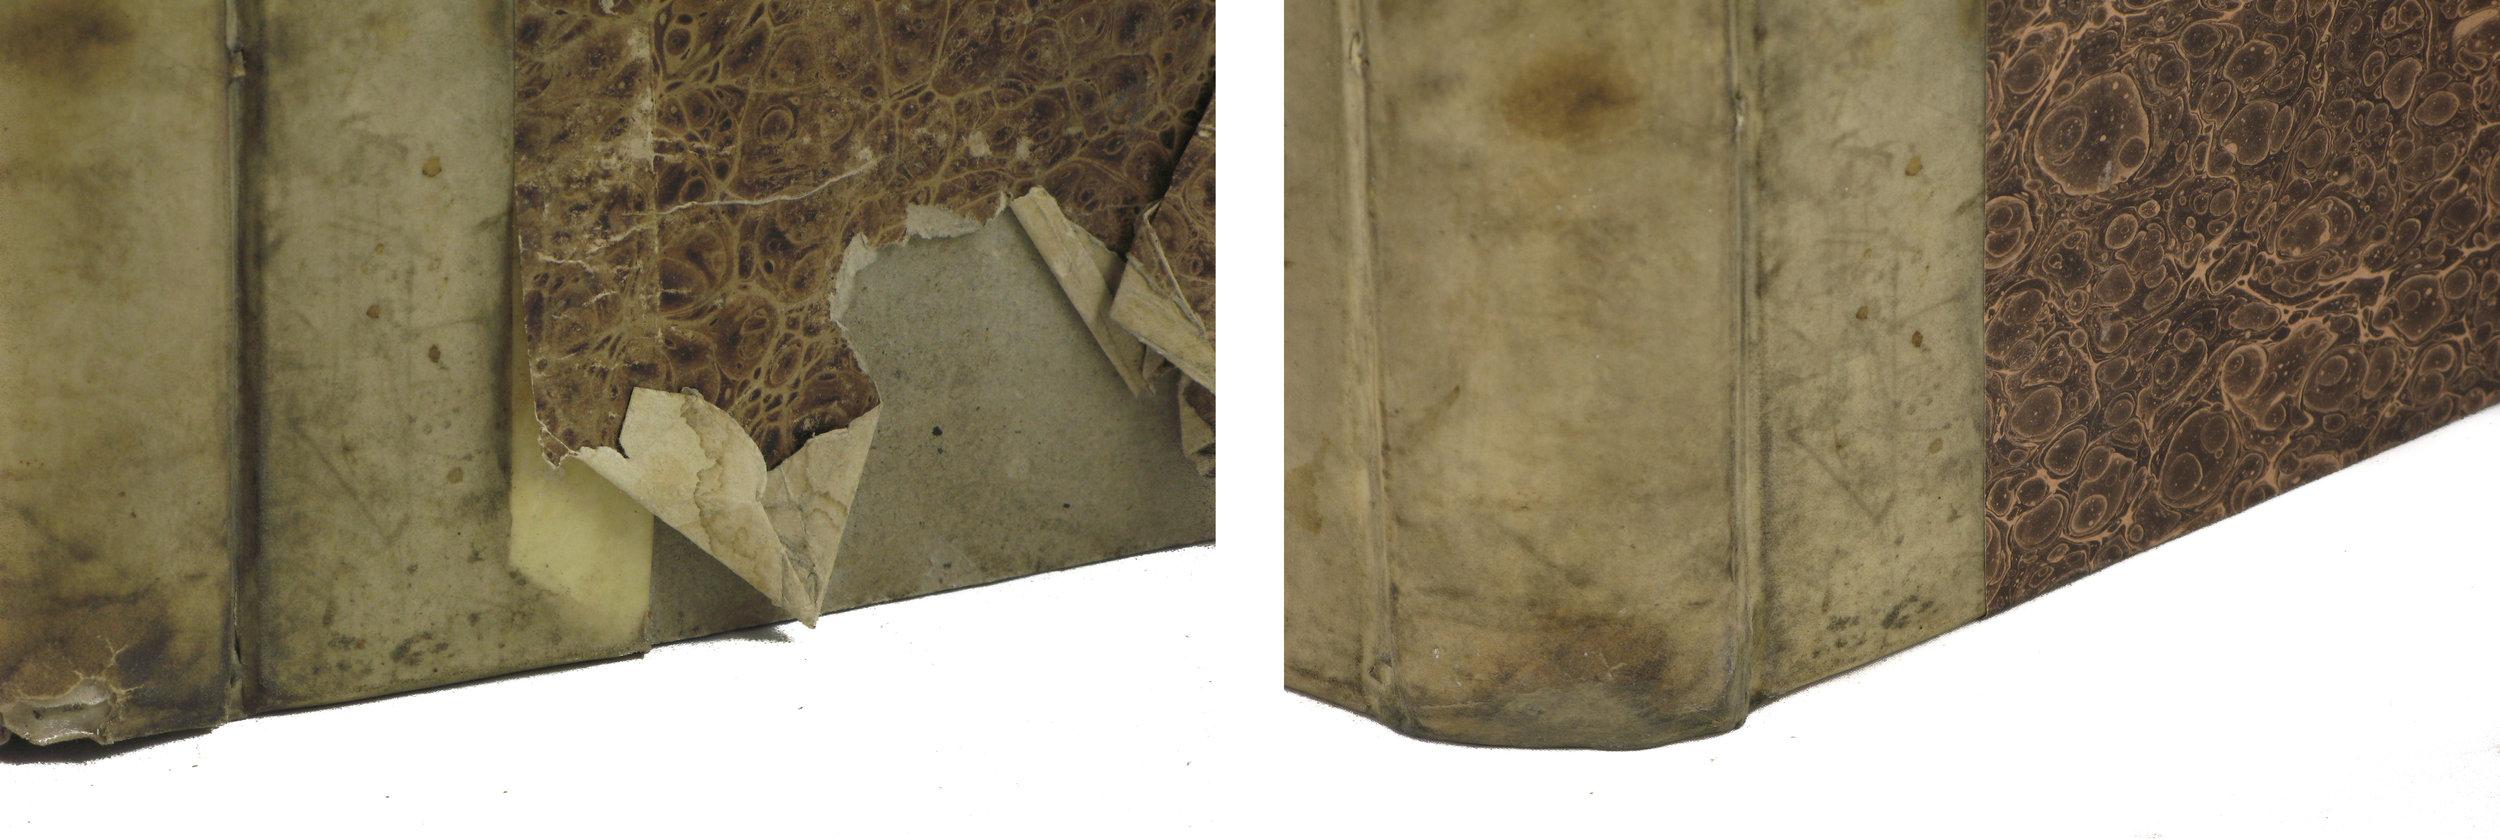 vellum spine restoration.10.jpg